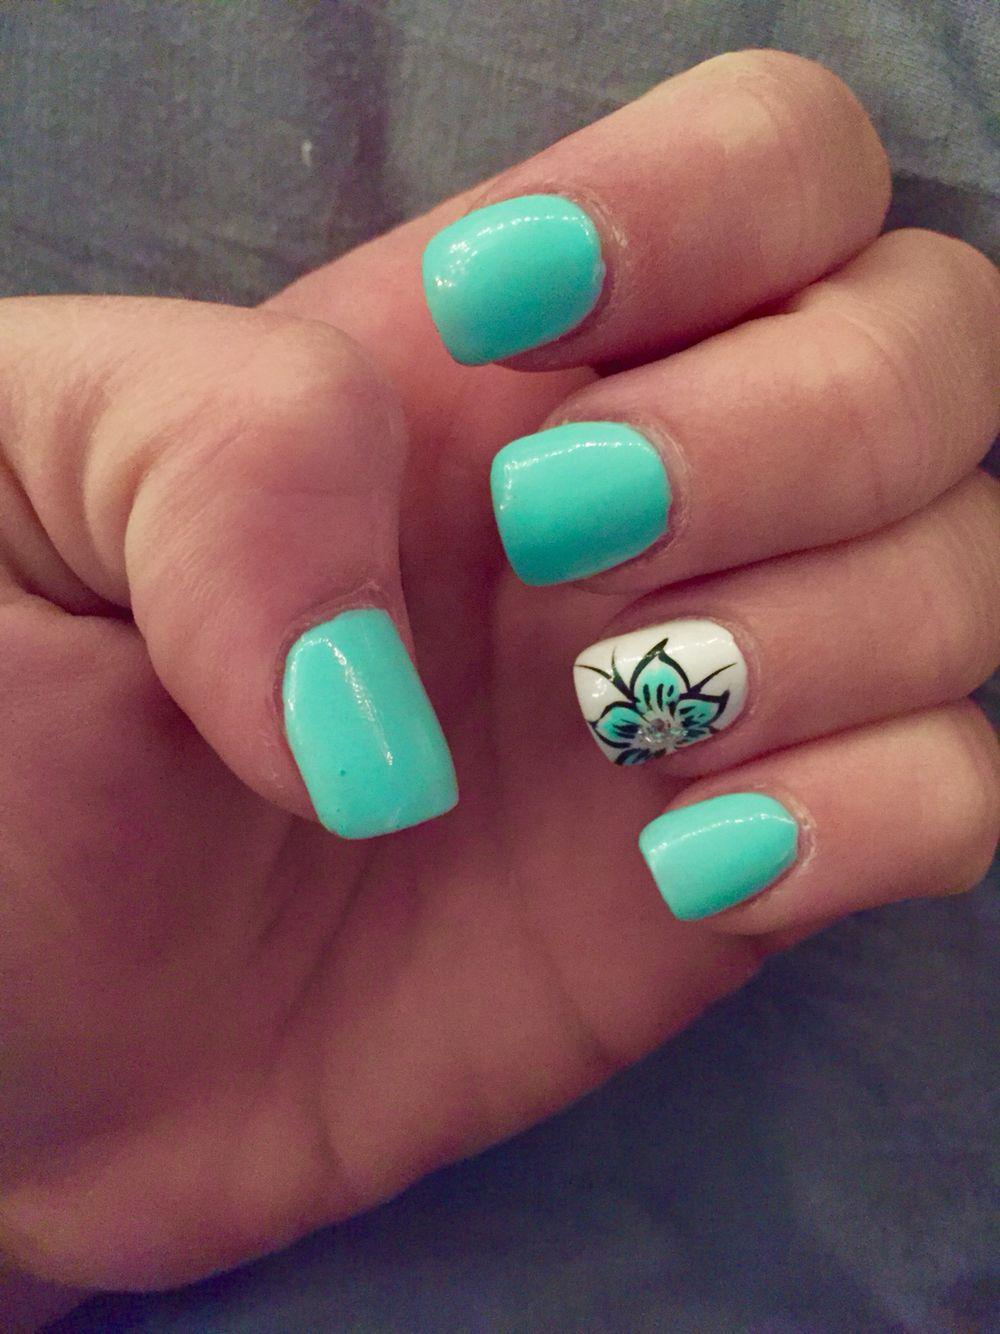 Vacation nails ! Beach Pedicure, Summer Pedicure Designs, Pedicure Summer,  Beach Toe Nails - Vacation Nails ! Nails In 2018 Pinterest Nails, Vacation Nails